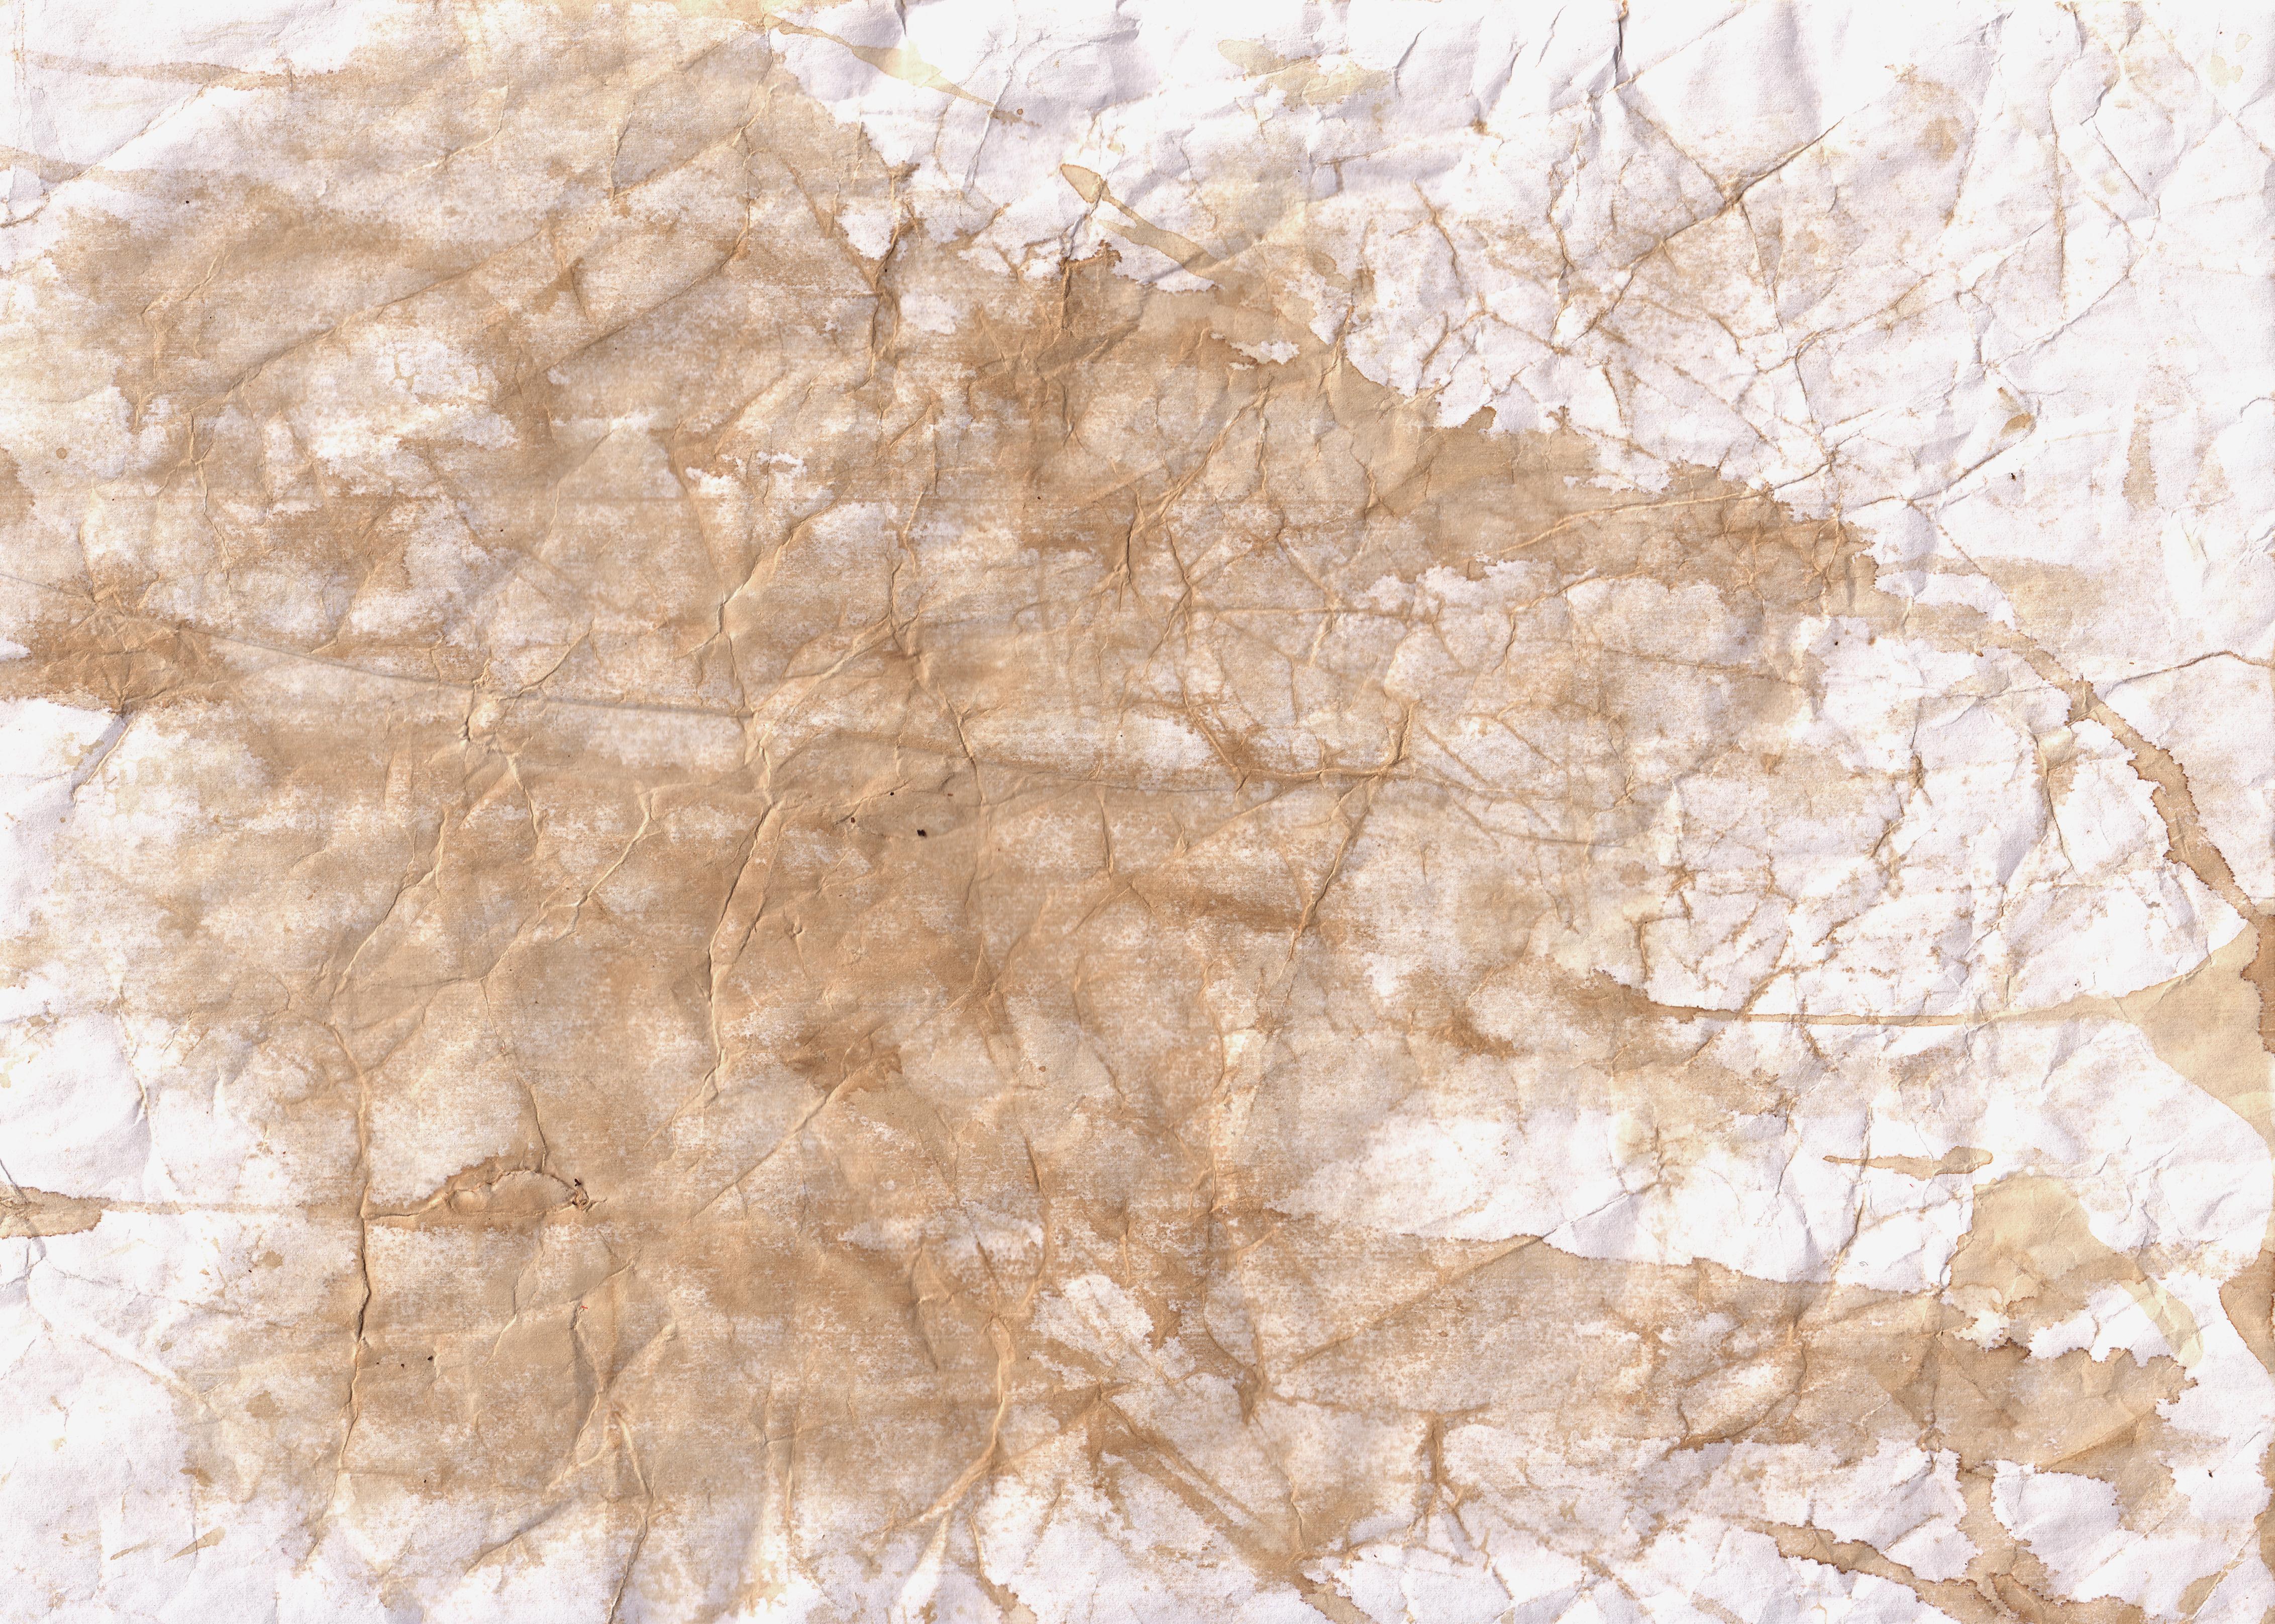 Untitled Texture CC